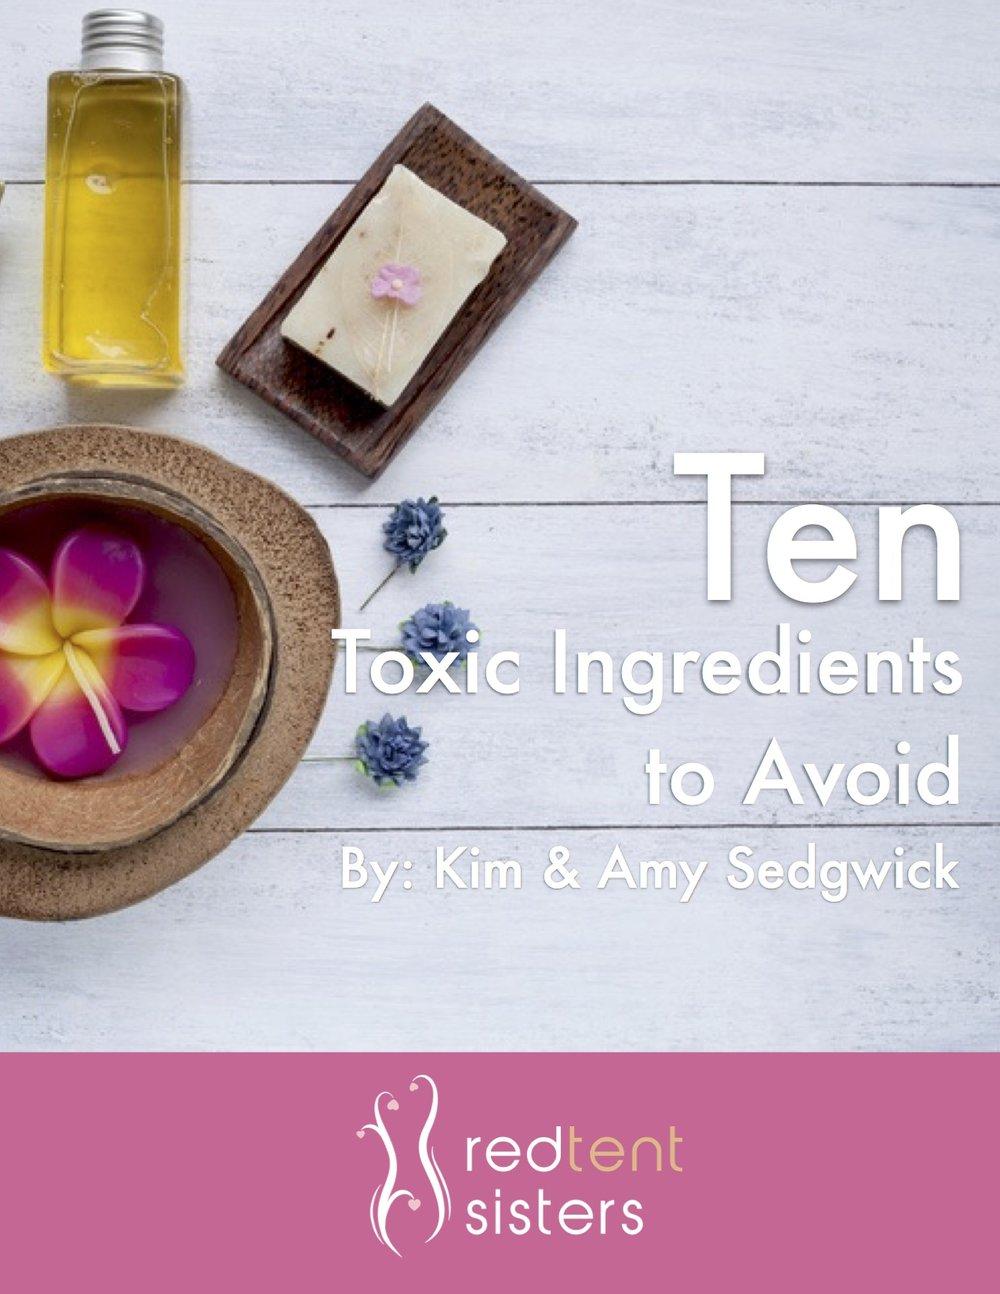 Toxic Ingredients (dragged).jpg